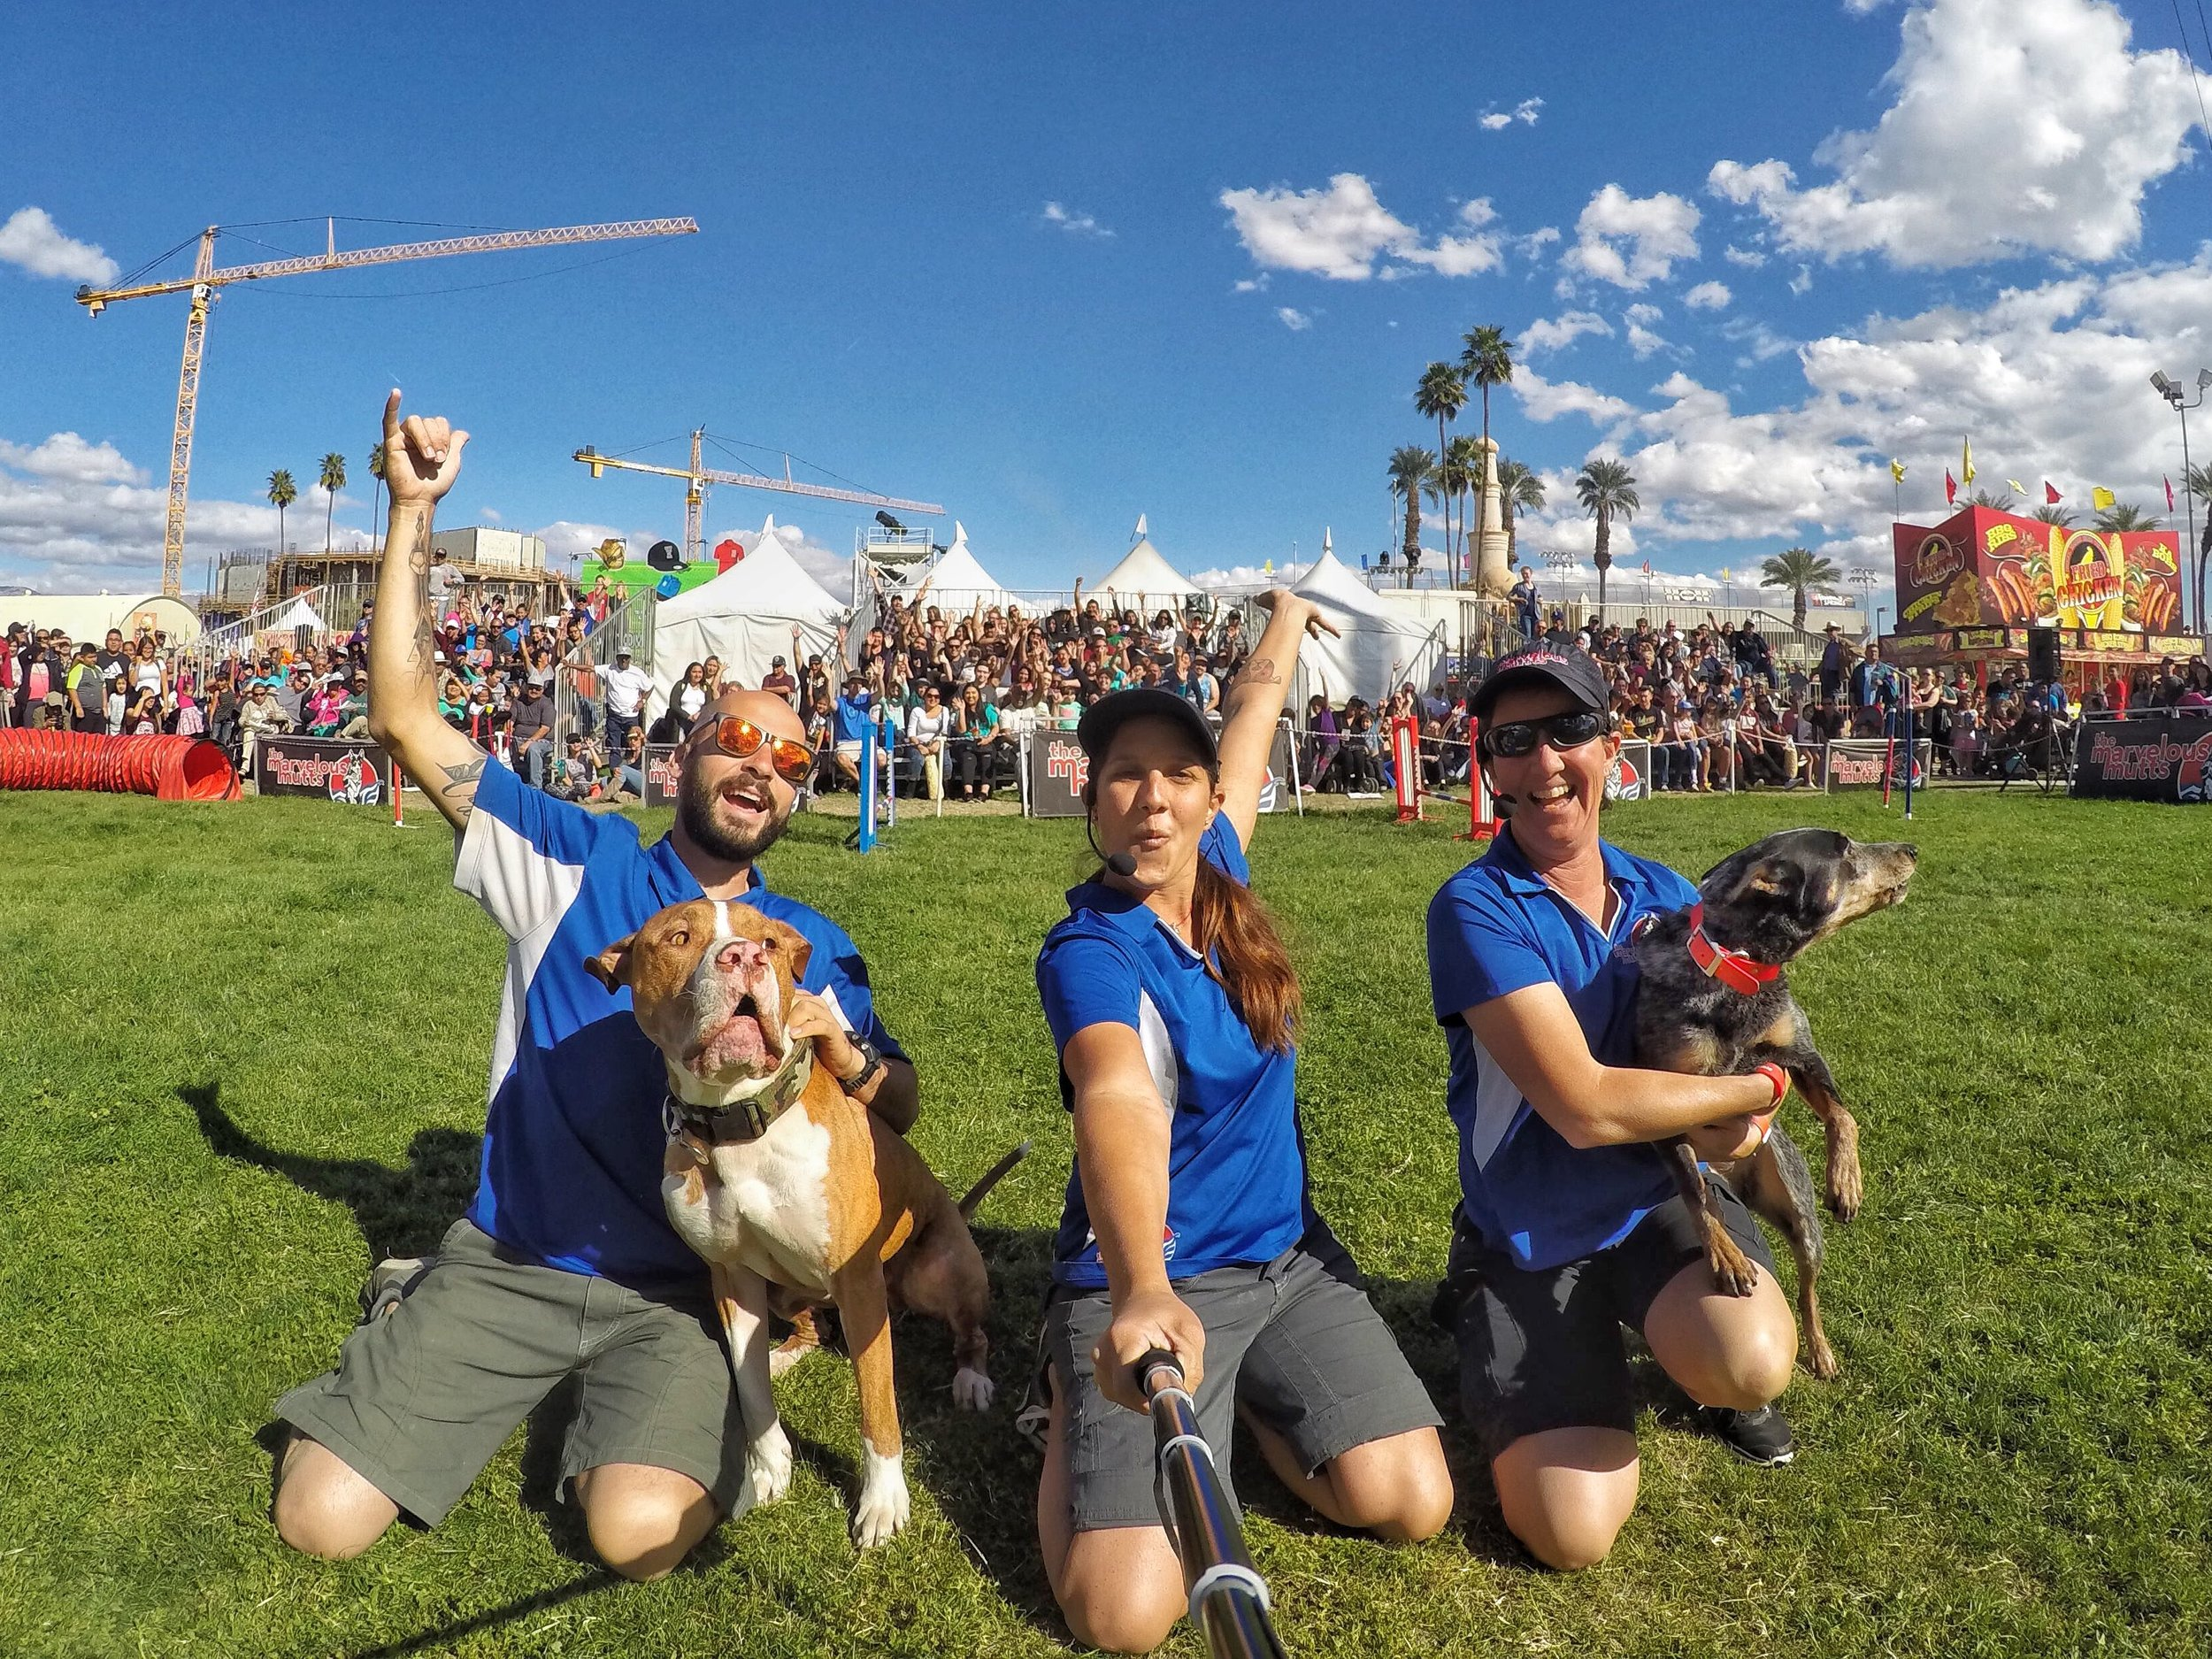 Chris, Bass, Deirani, Nadja and Ba-Ba-Lu on the last day of the Riverside County Fair & National Date Festival.